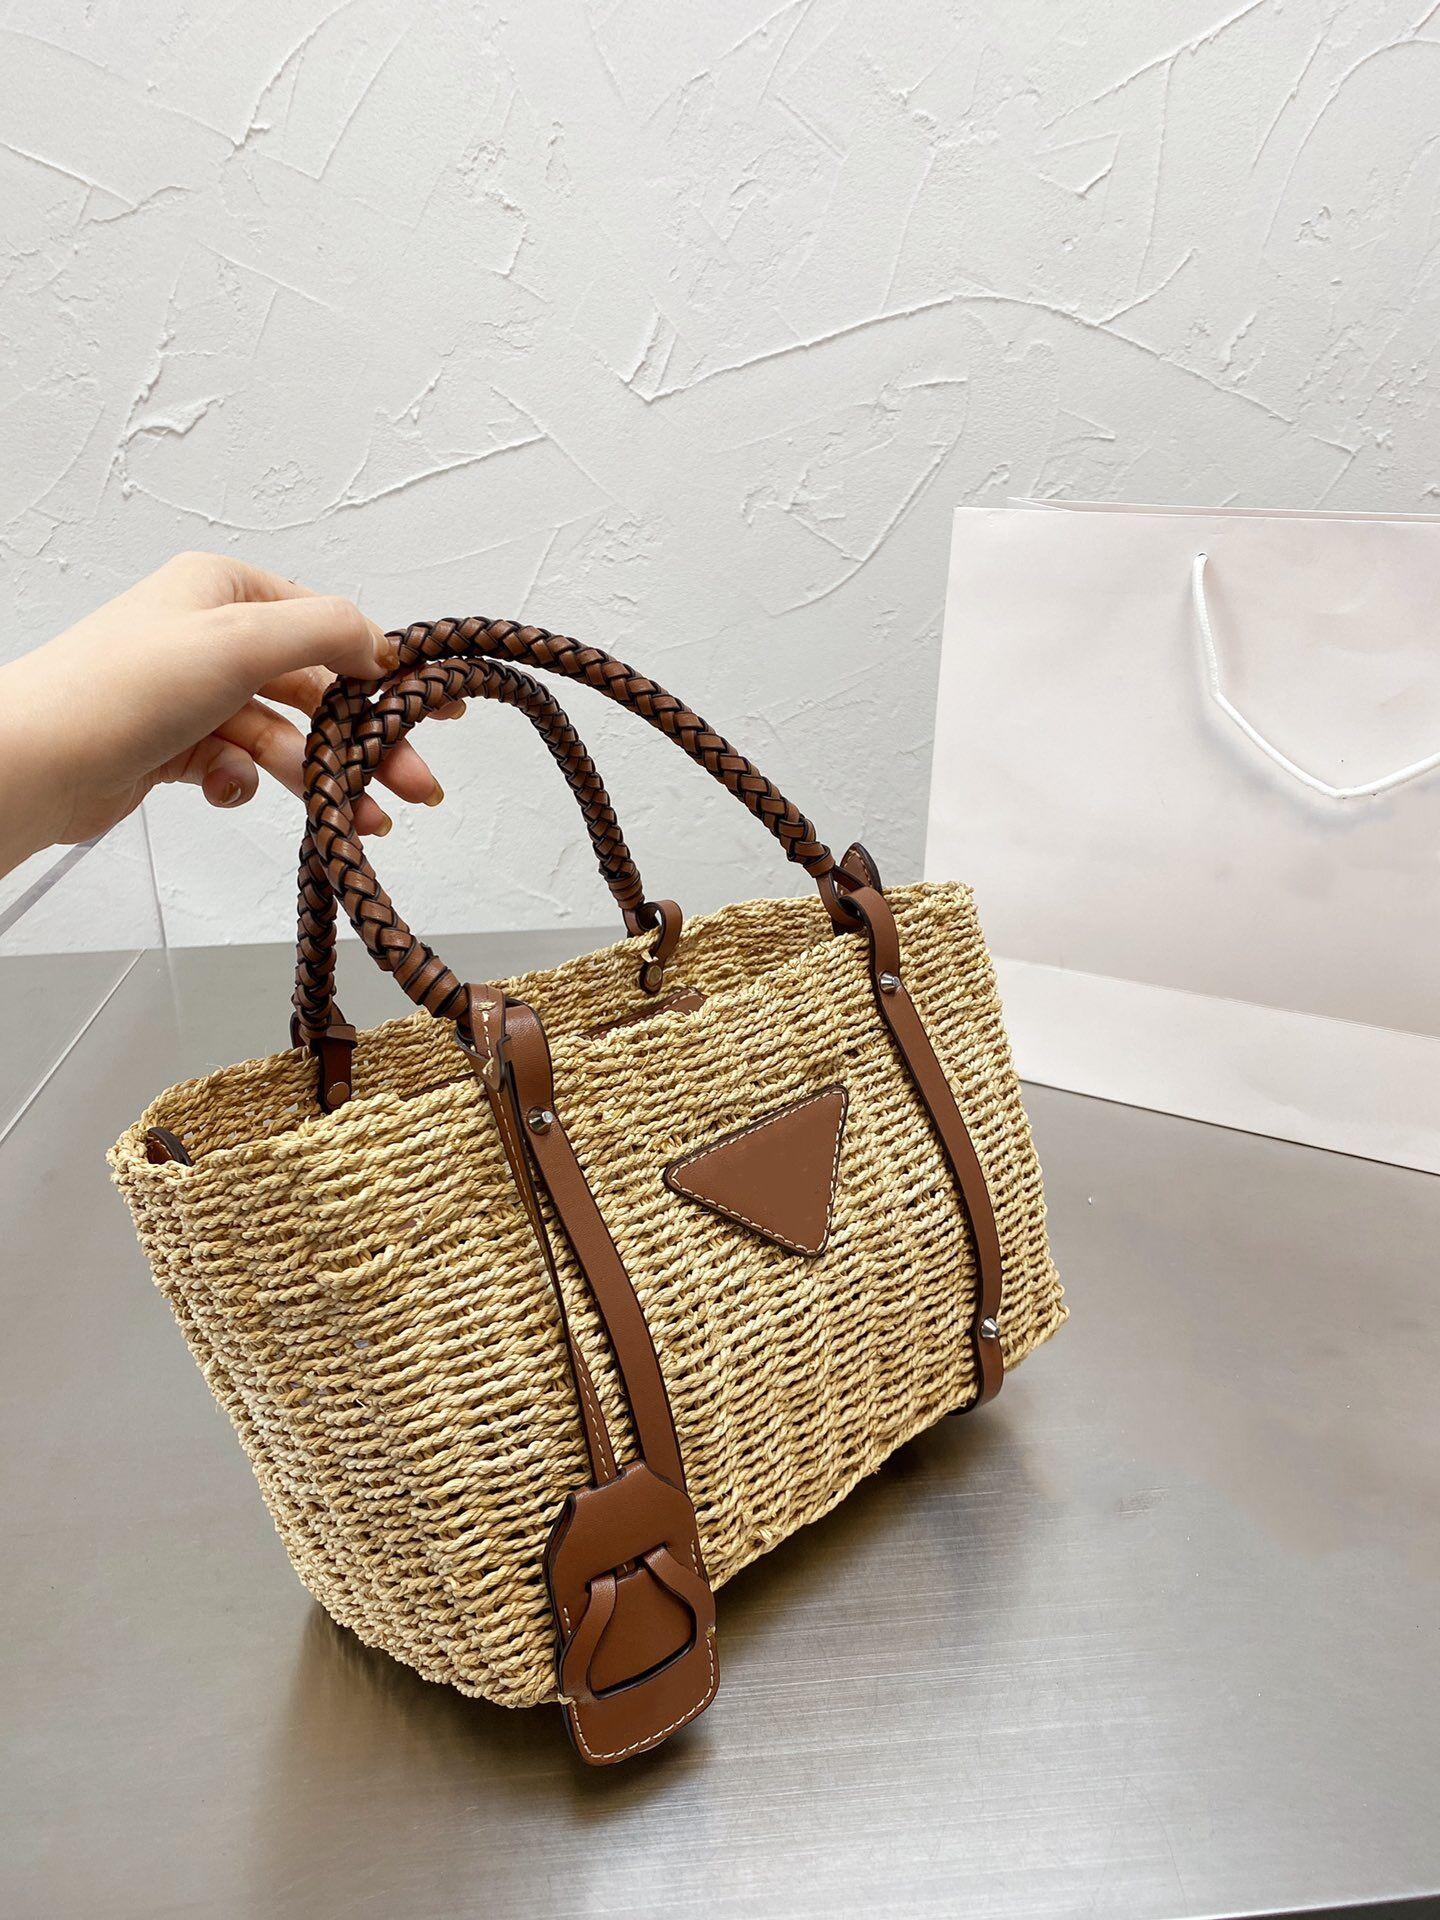 Men's and women's handmade straw woven bag classic vegetable basket bag large capacity handbag